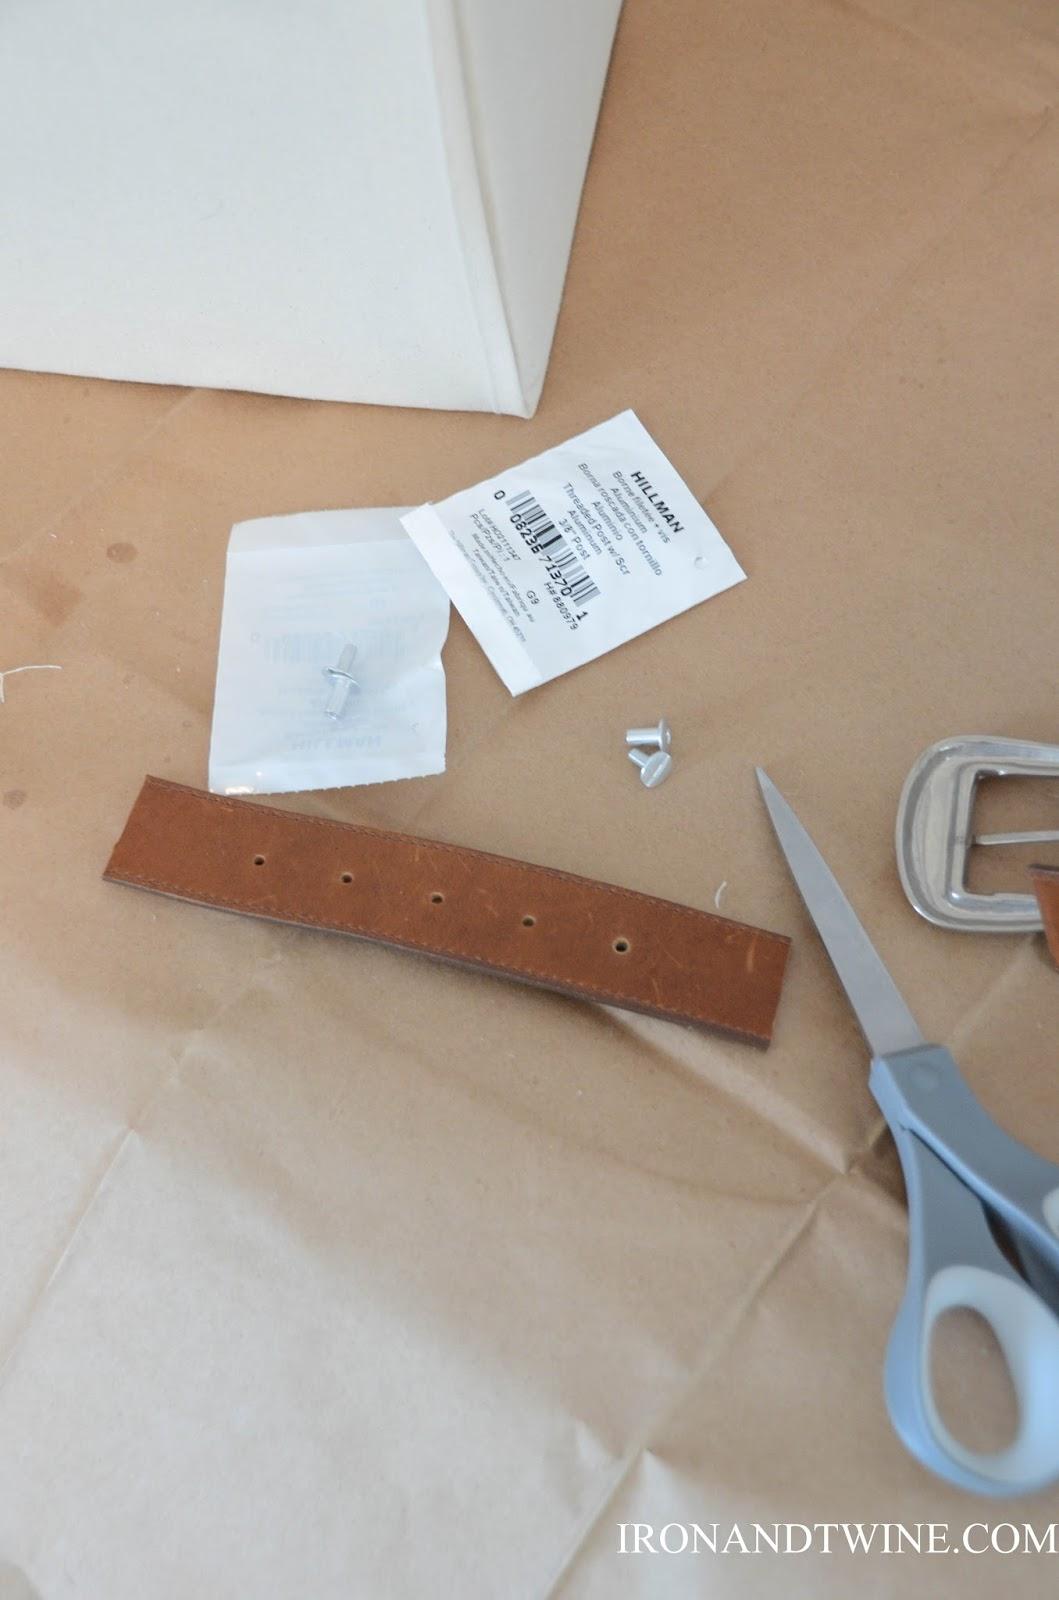 DIY+Belt+Handled+Box,+DIY+fabric+covered+box,+Iron+and+Twine+(33).jpg